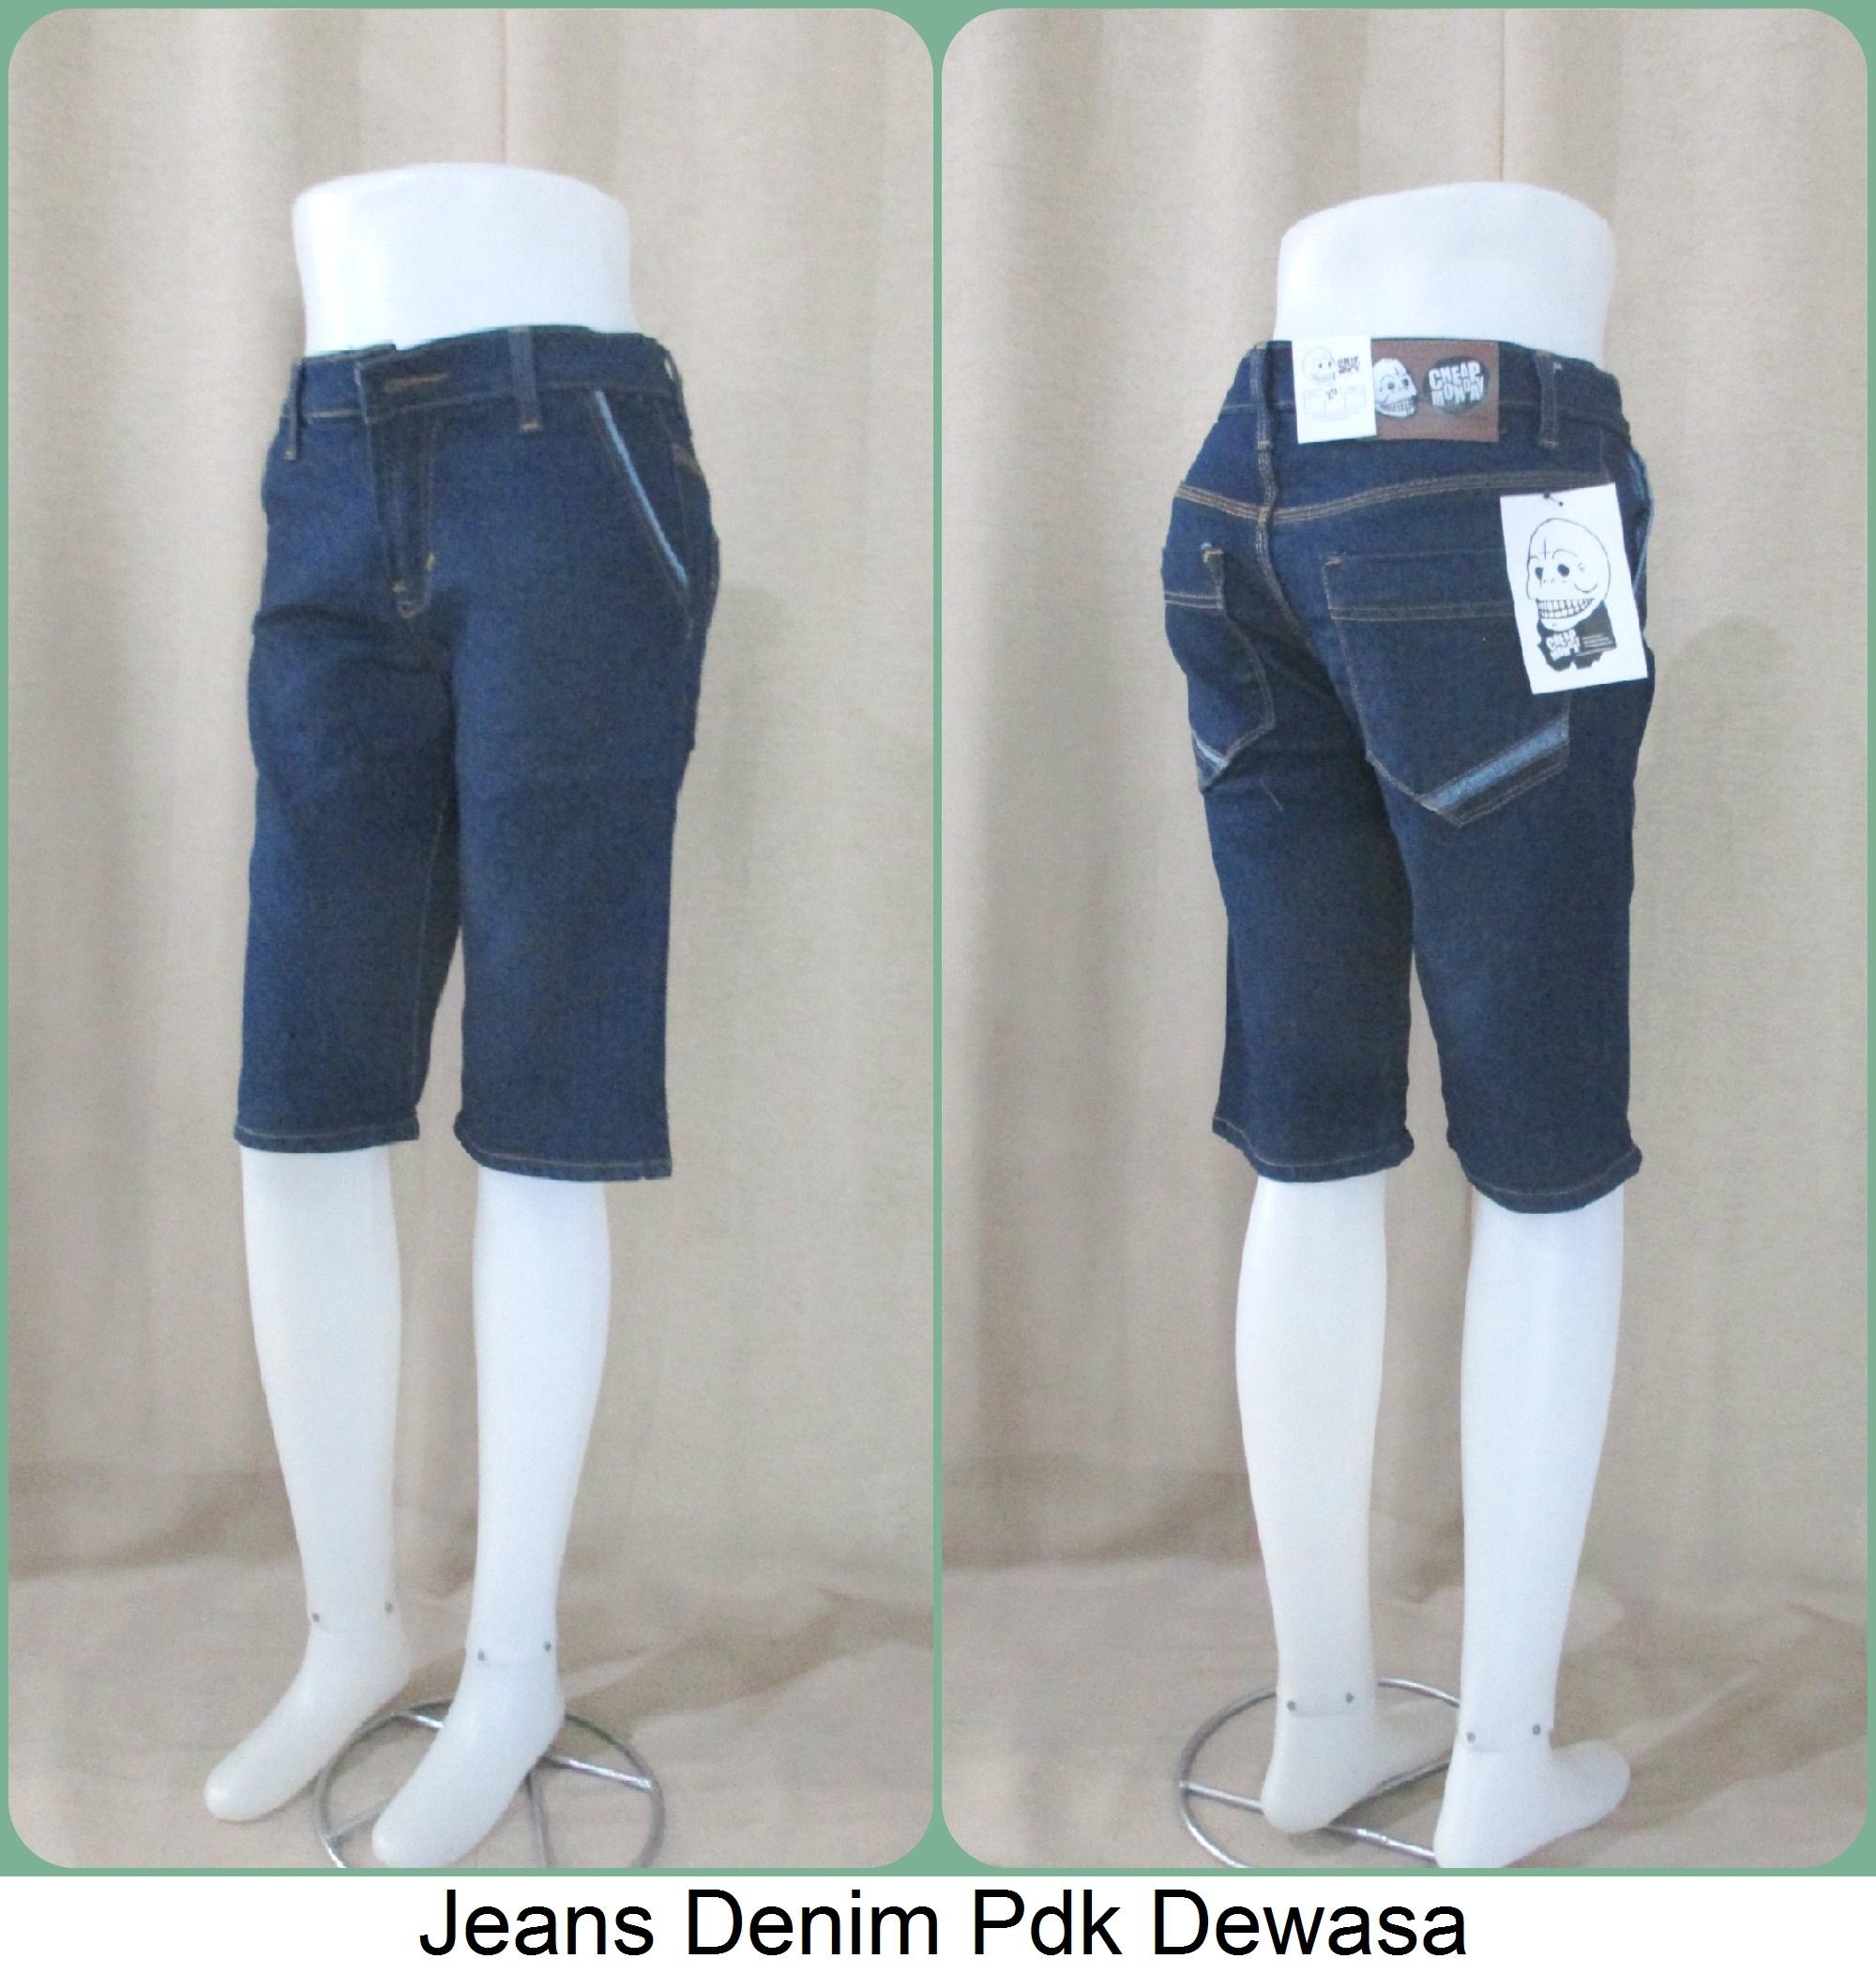 Sentra Grosiran Jeans Denim Pdk Dewasa Murah Meriah